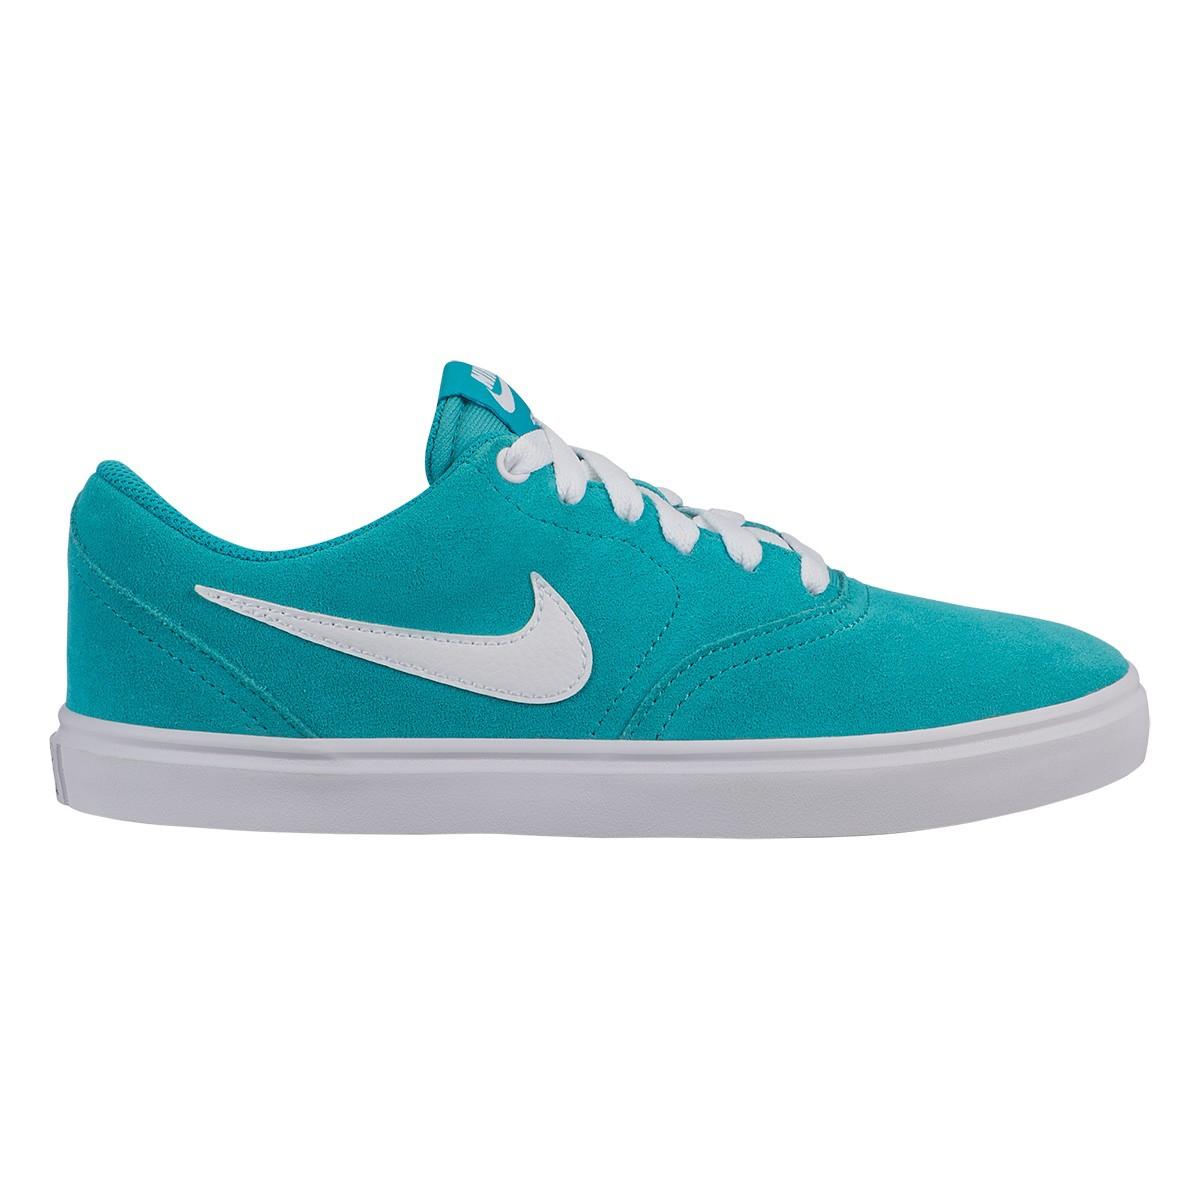 Tênis Nike Wmns Sb Check Solar Feminino - Azul Piscina e Branco